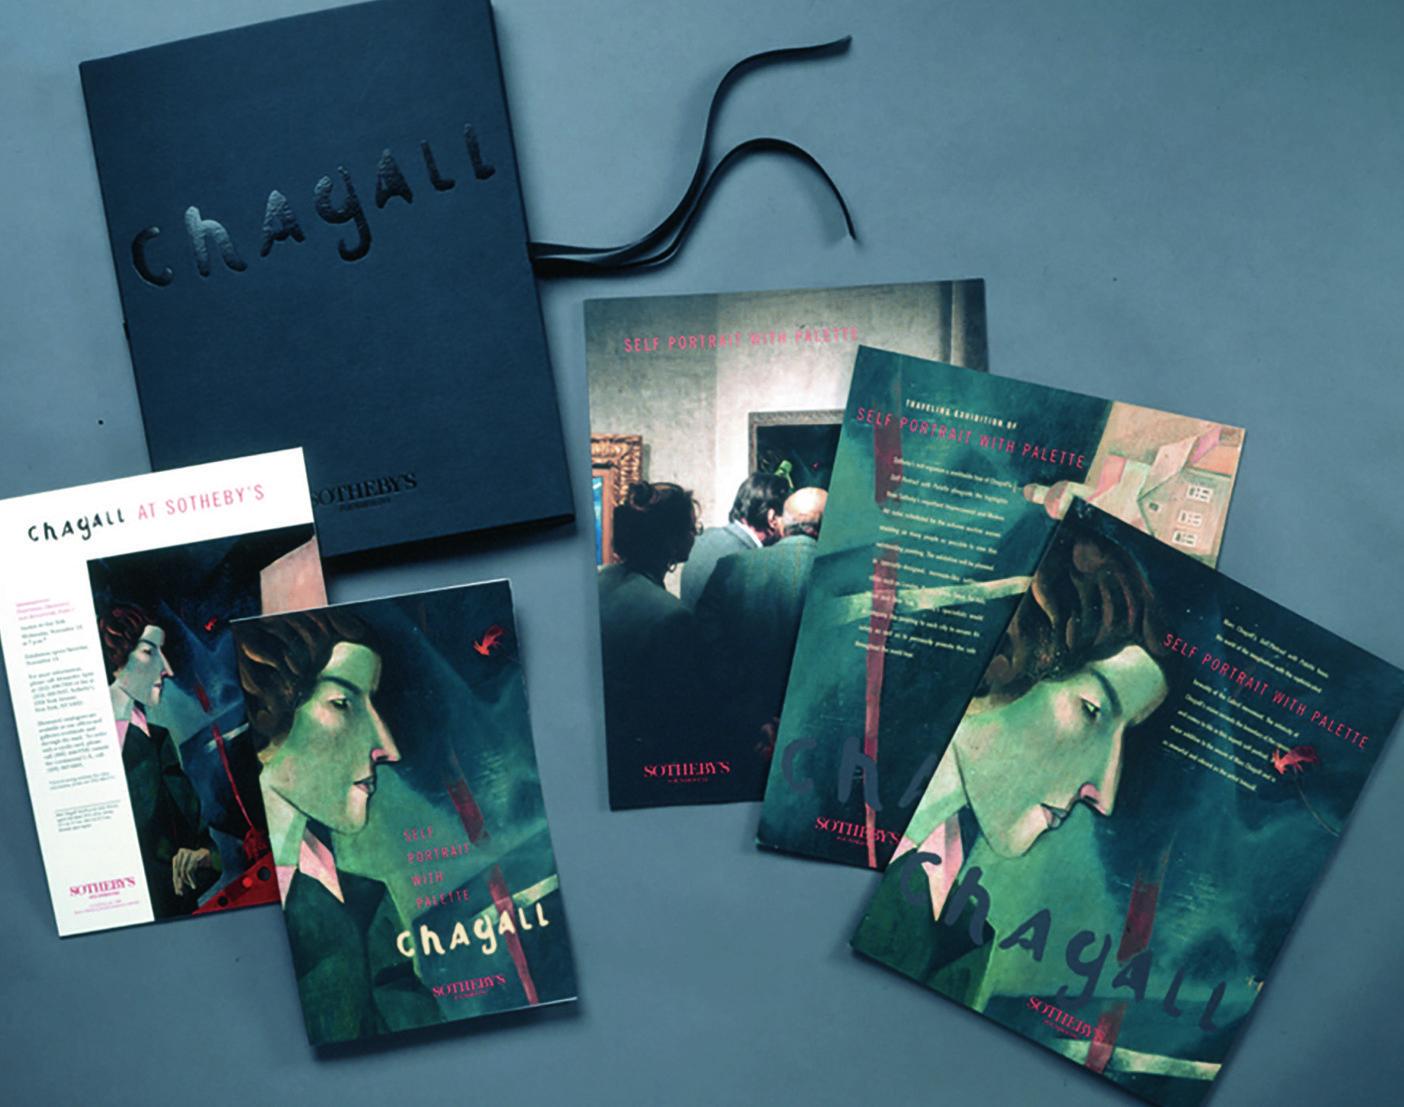 Mark Goodson_chagall collection_a.jpg